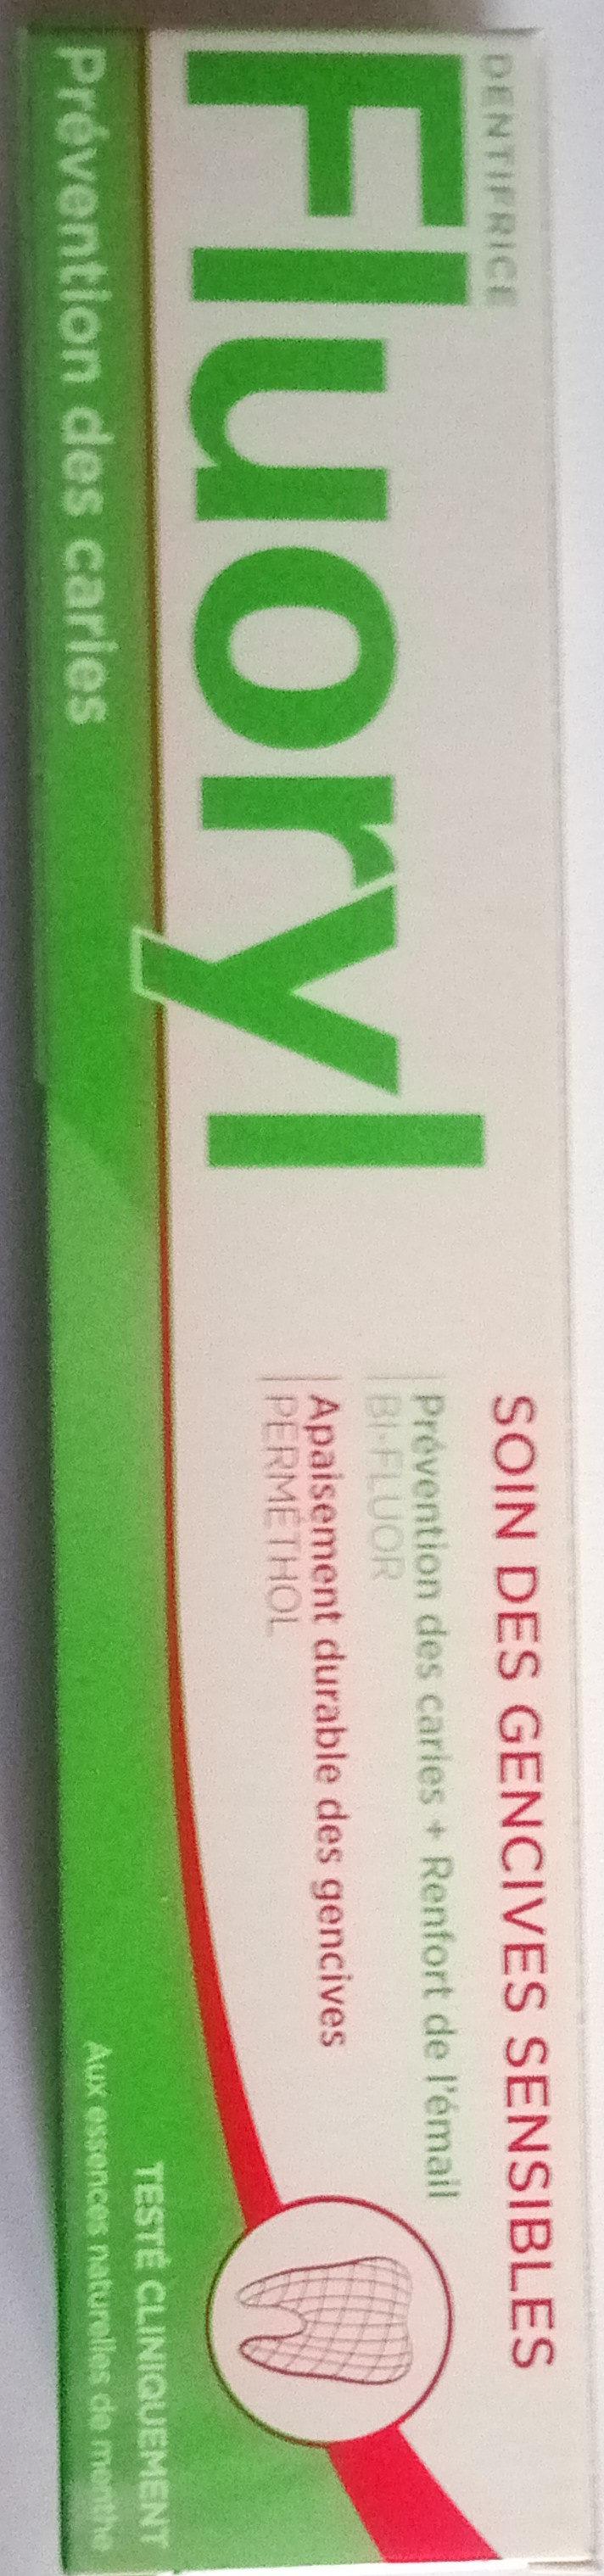 Fluoryl - Product